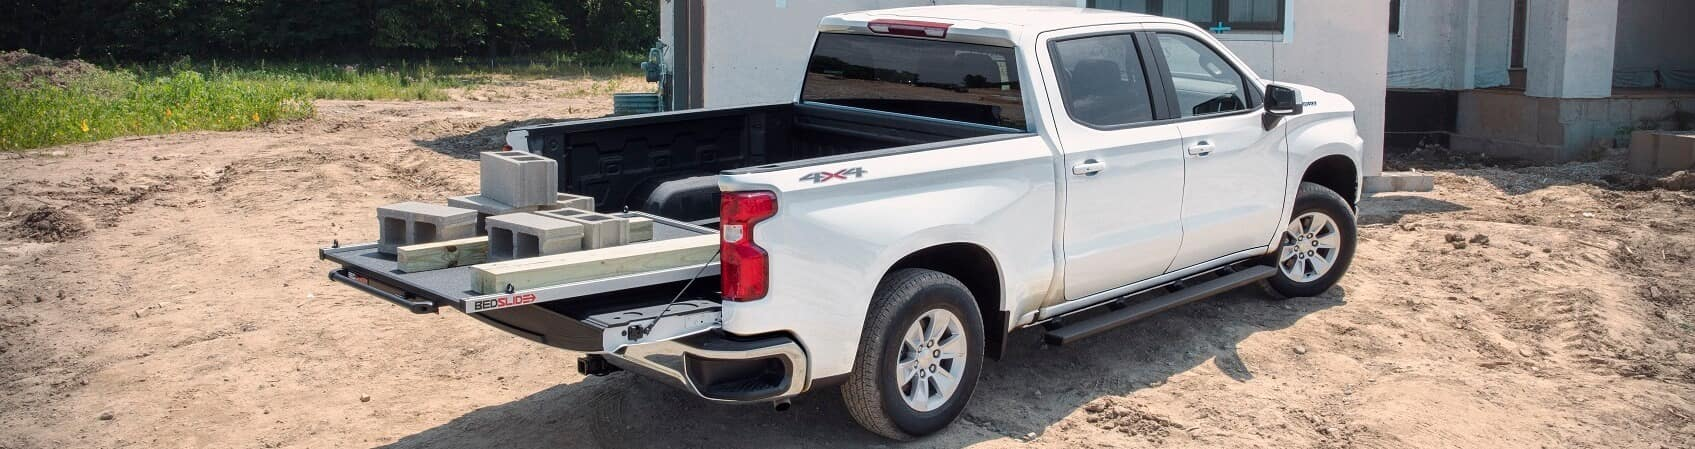 Chevy Silverado 1500 for Sale near Hampton Township PA